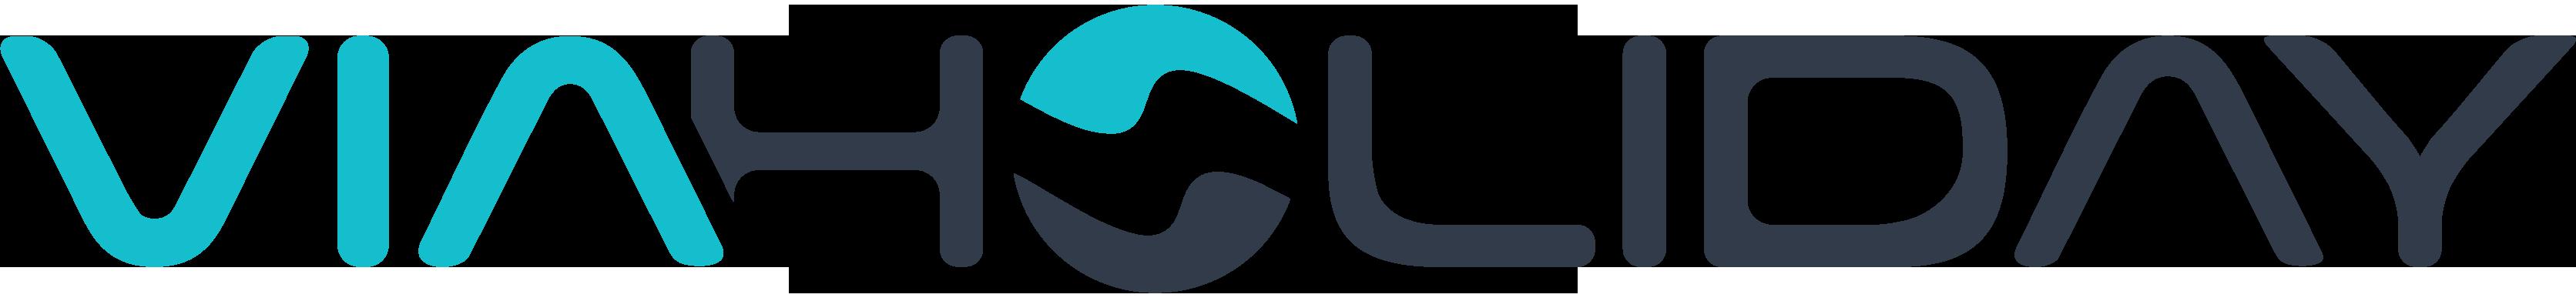 ViaHoliday Logo